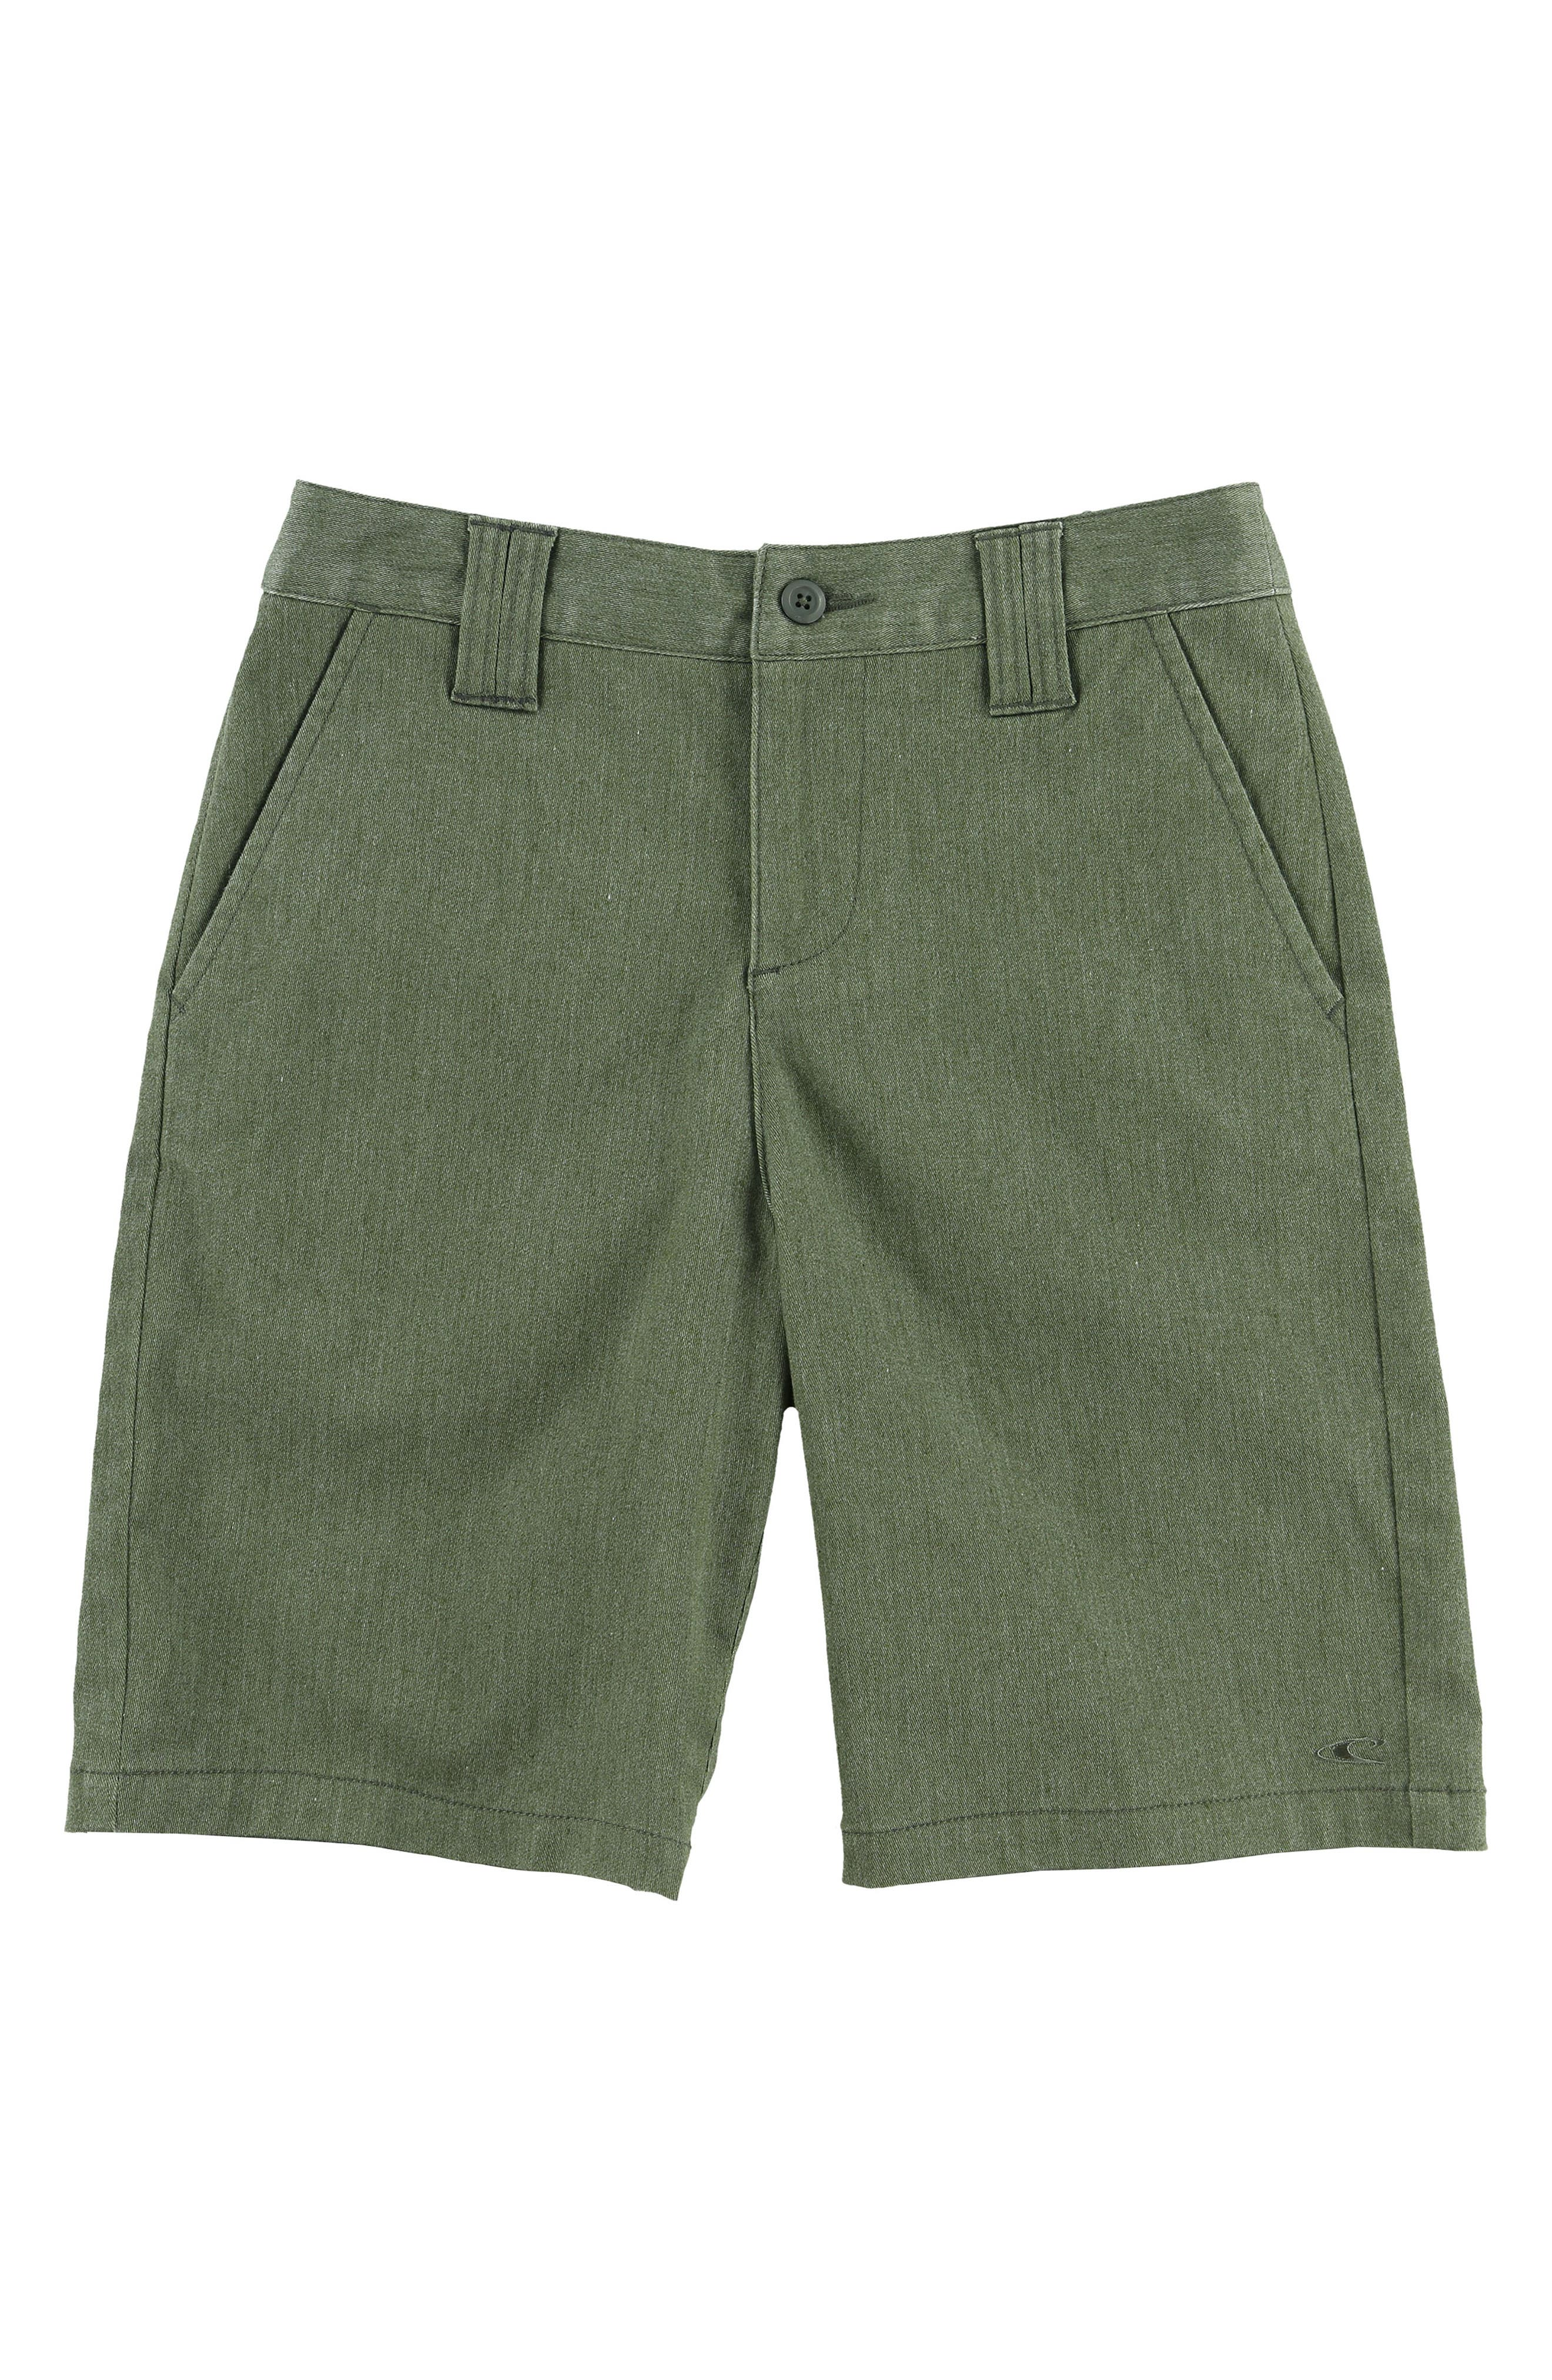 O'Neill Contact Stretch Shorts (Big Boys)